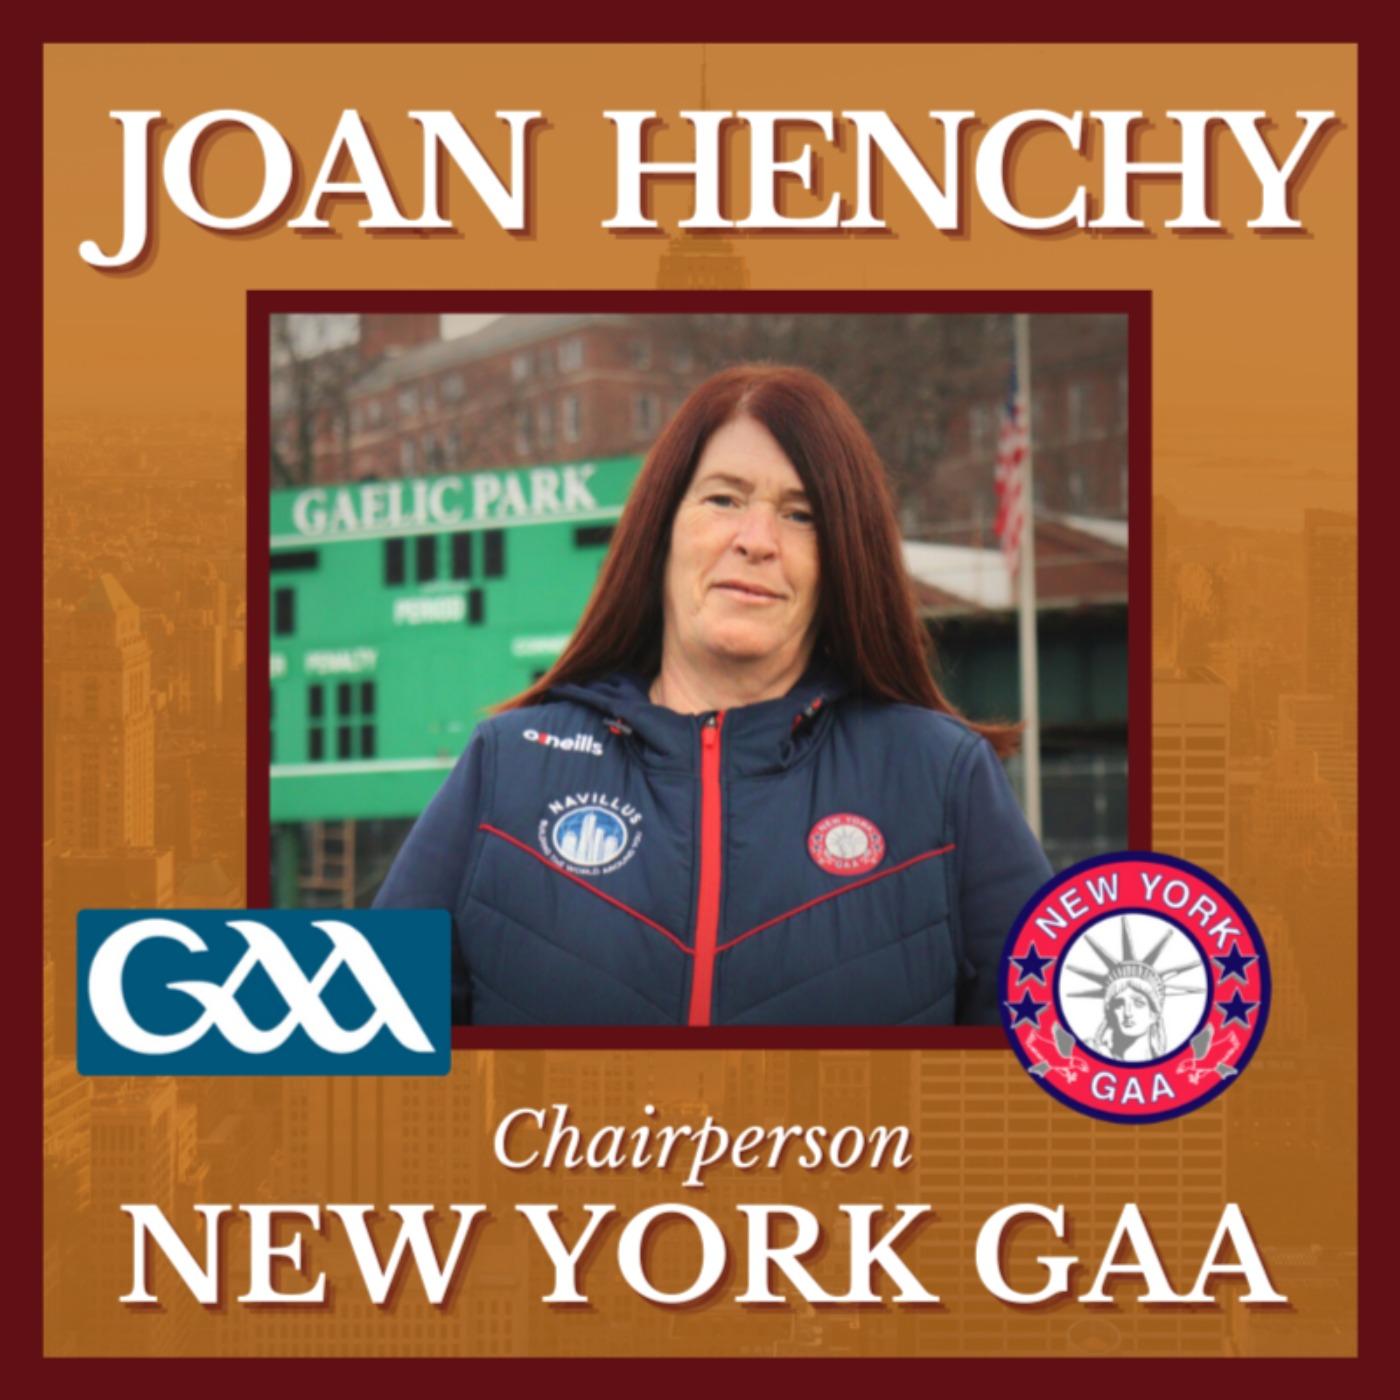 Joan Henchy – New York GAA County Board Chairperson